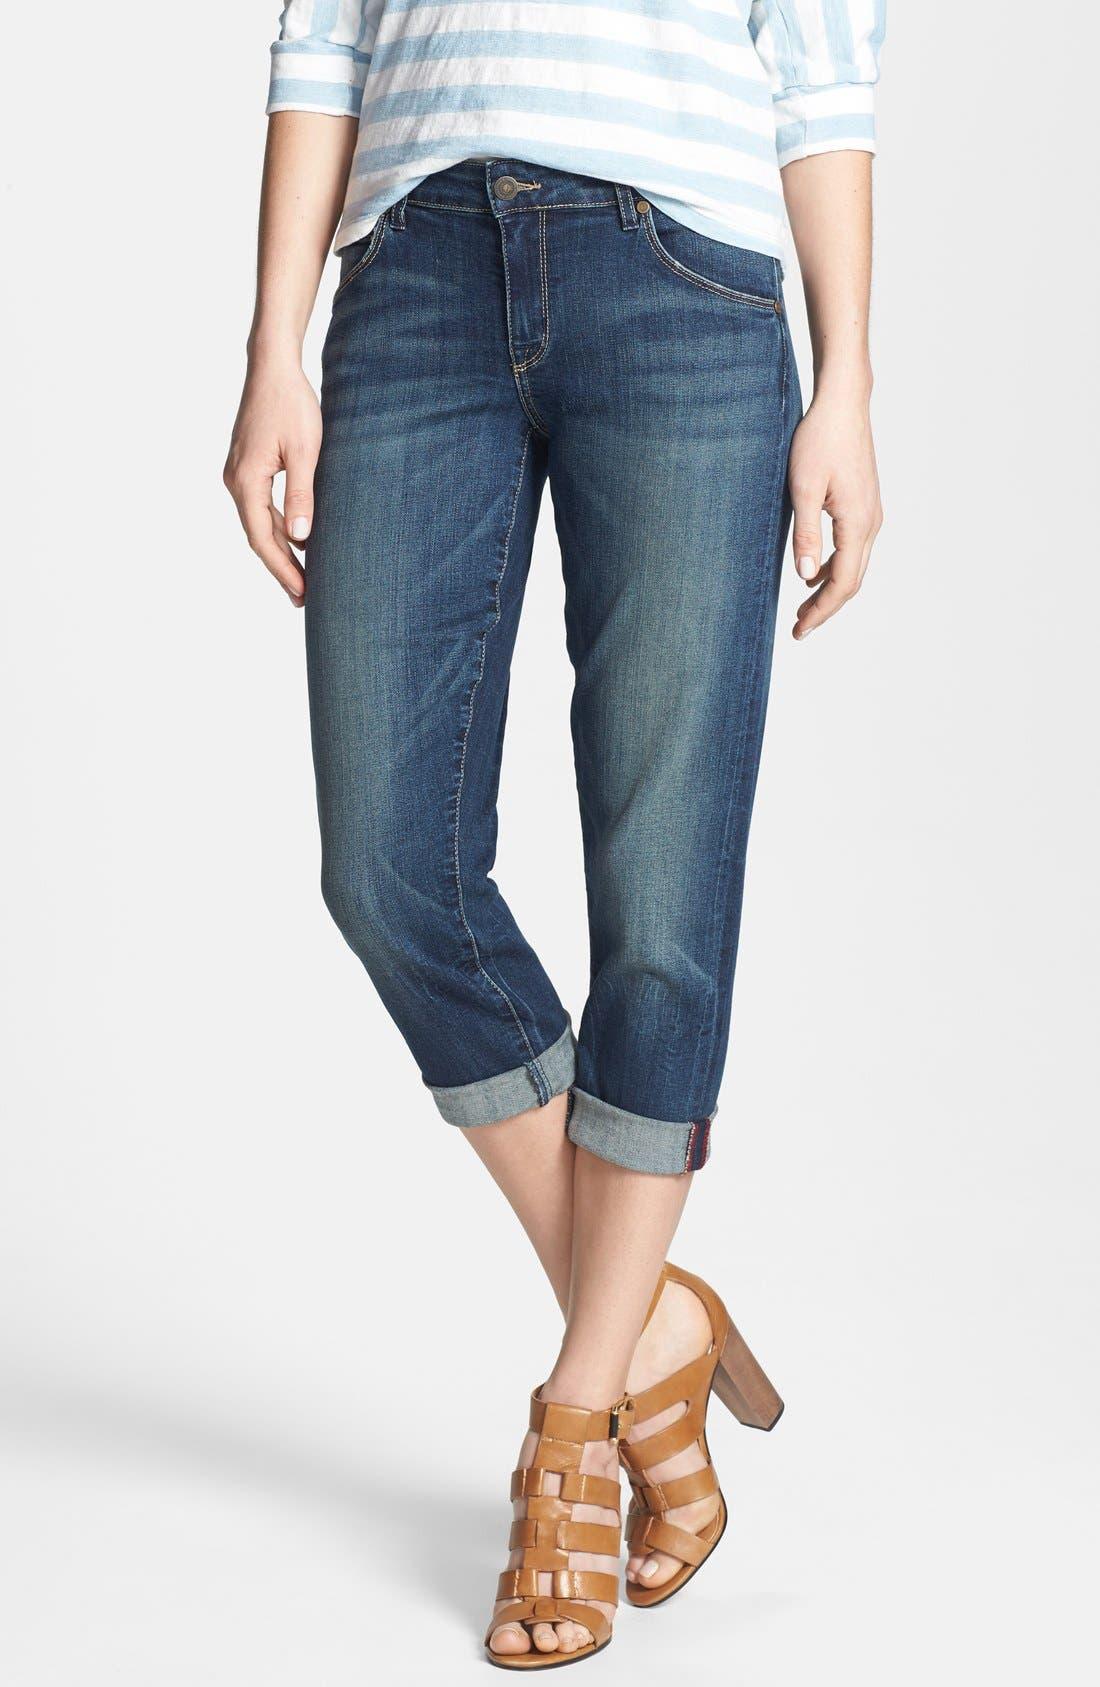 Alternate Image 1 Selected - CJ by Cookie Johnson 'Rejoice' Stretch Crop Boyfriend Jeans (Tops)